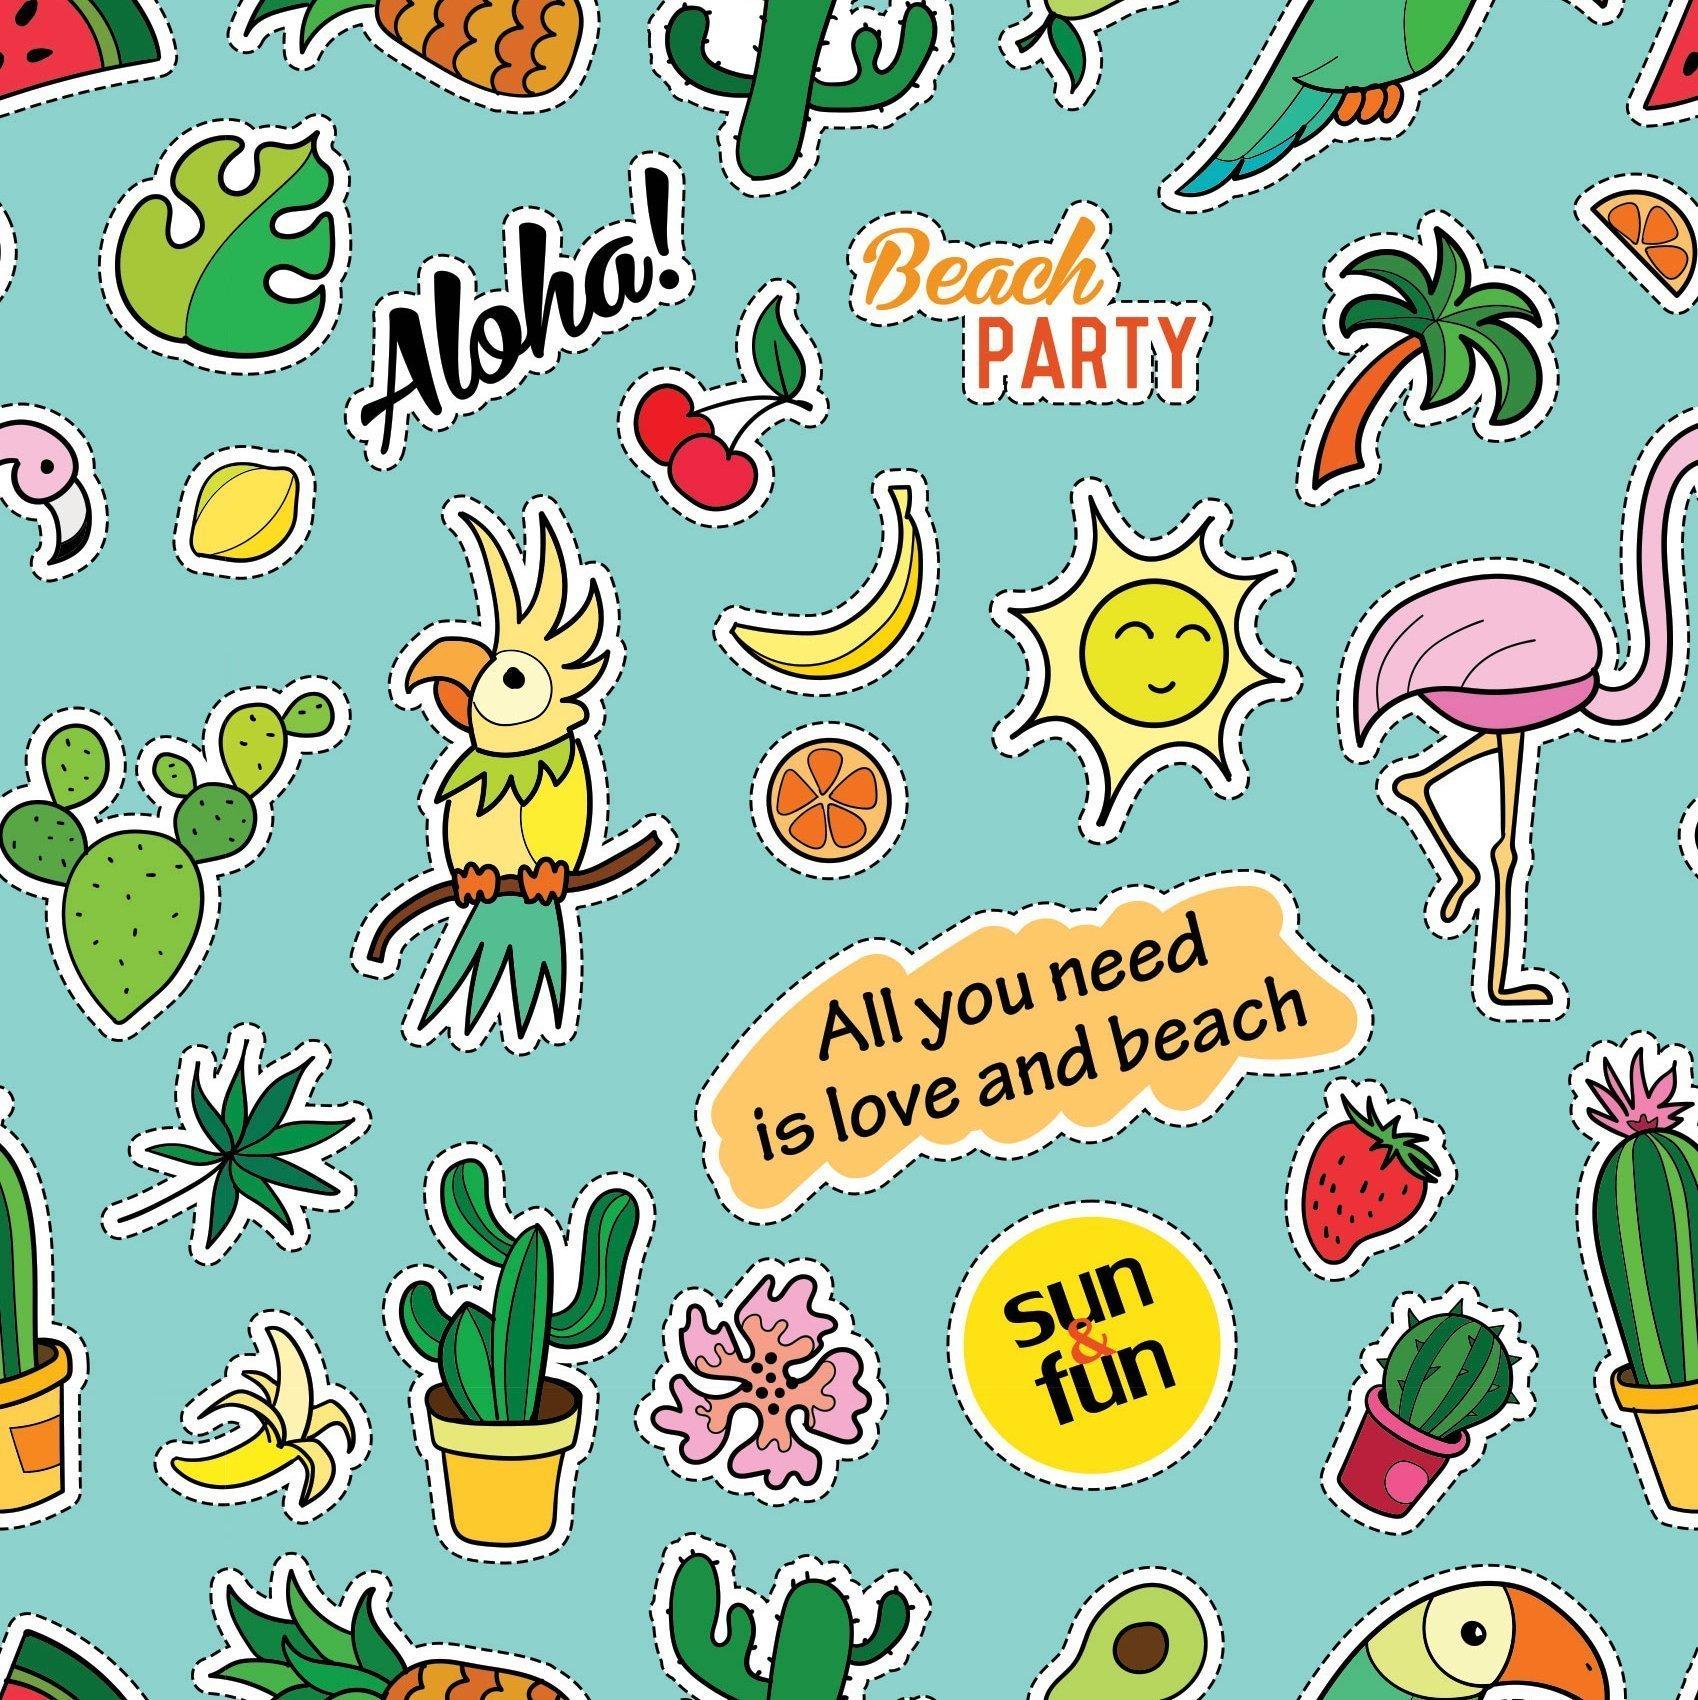 Plakfolie Beach Party 6510 - 45cm x 2m